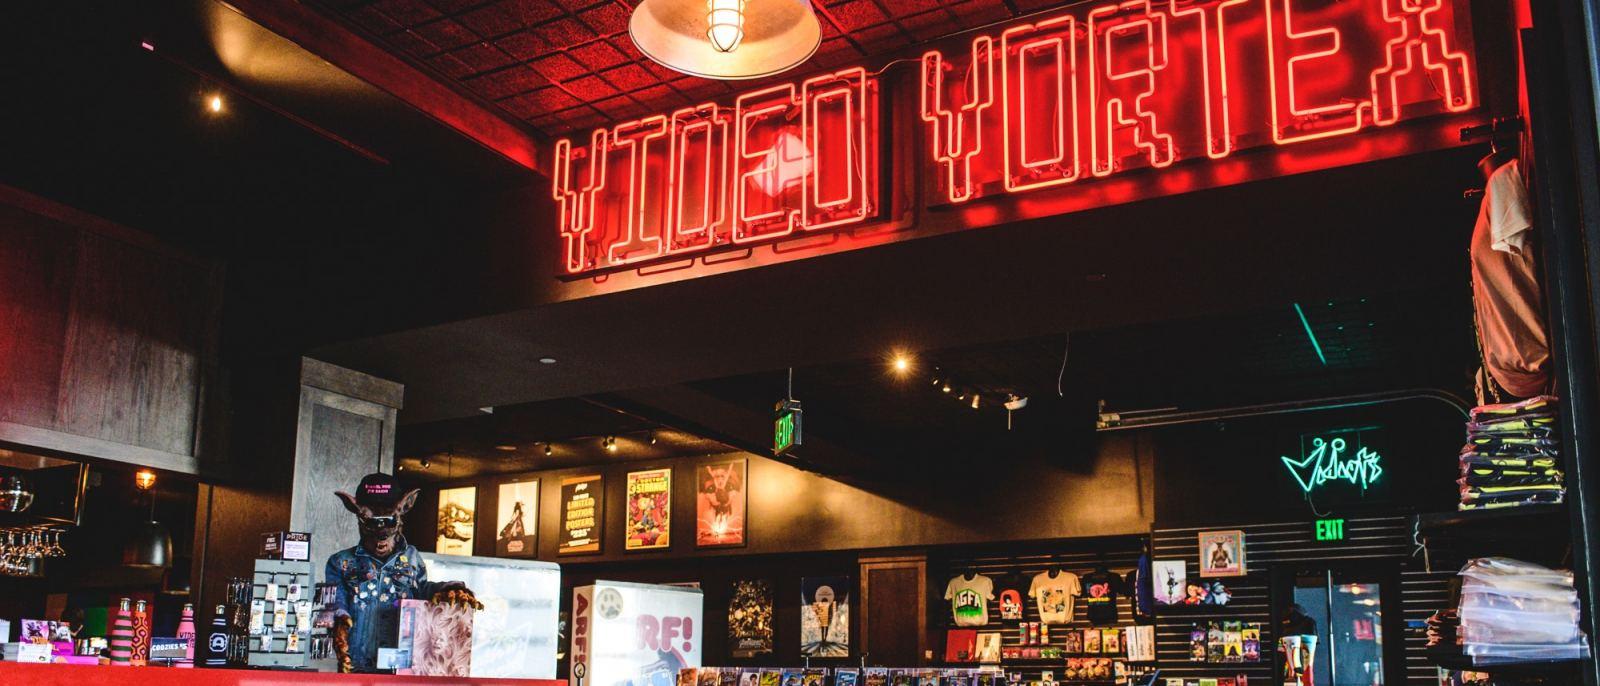 Video Vortex | Photo: Alamo Drafthouse Los Angeles